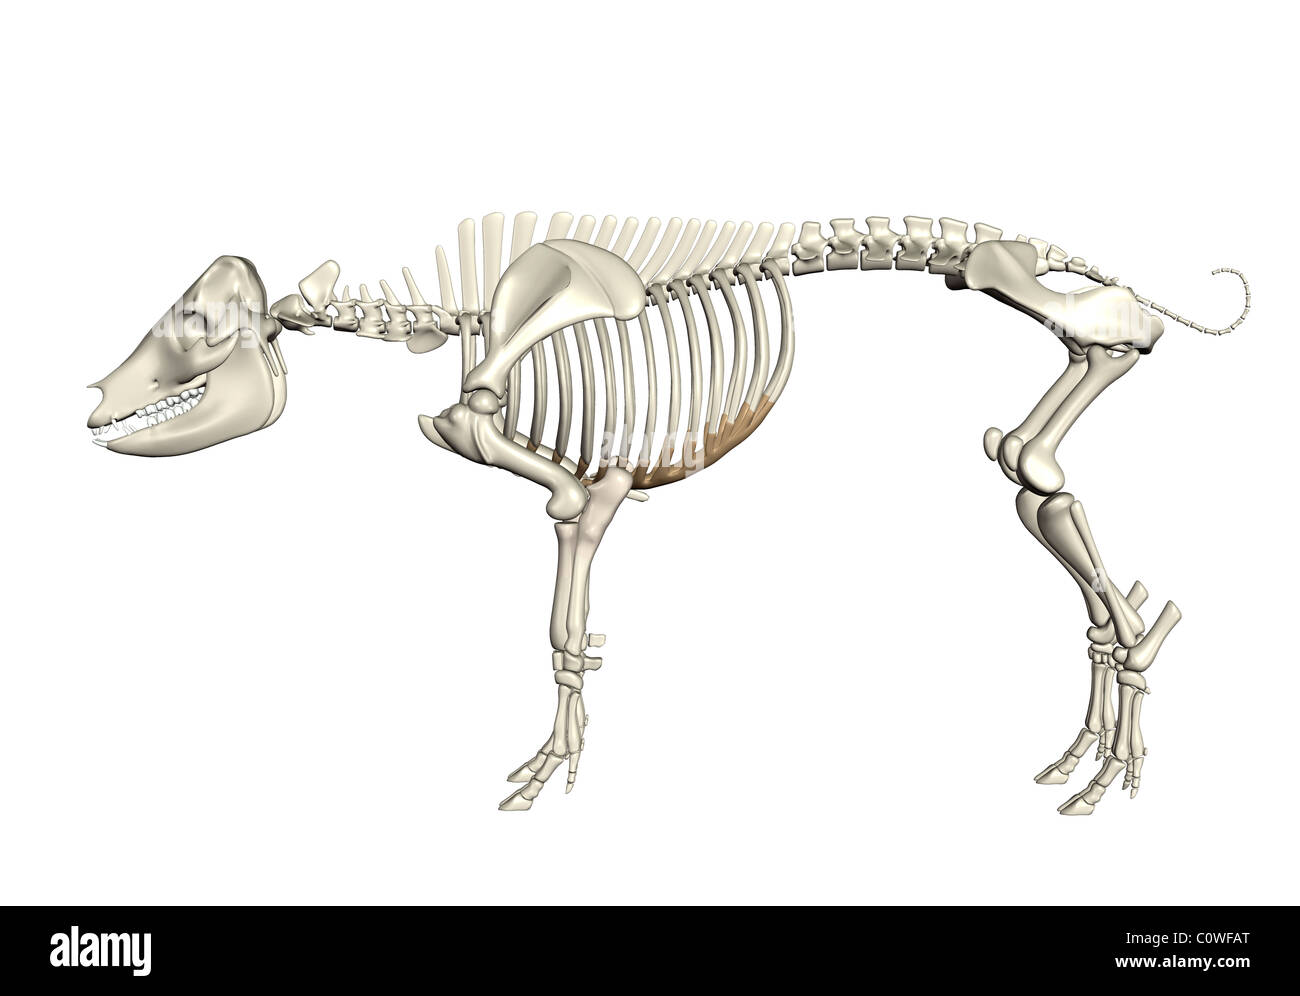 Schwein Anatomie Skelett Stockfoto, Bild: 34981600 - Alamy